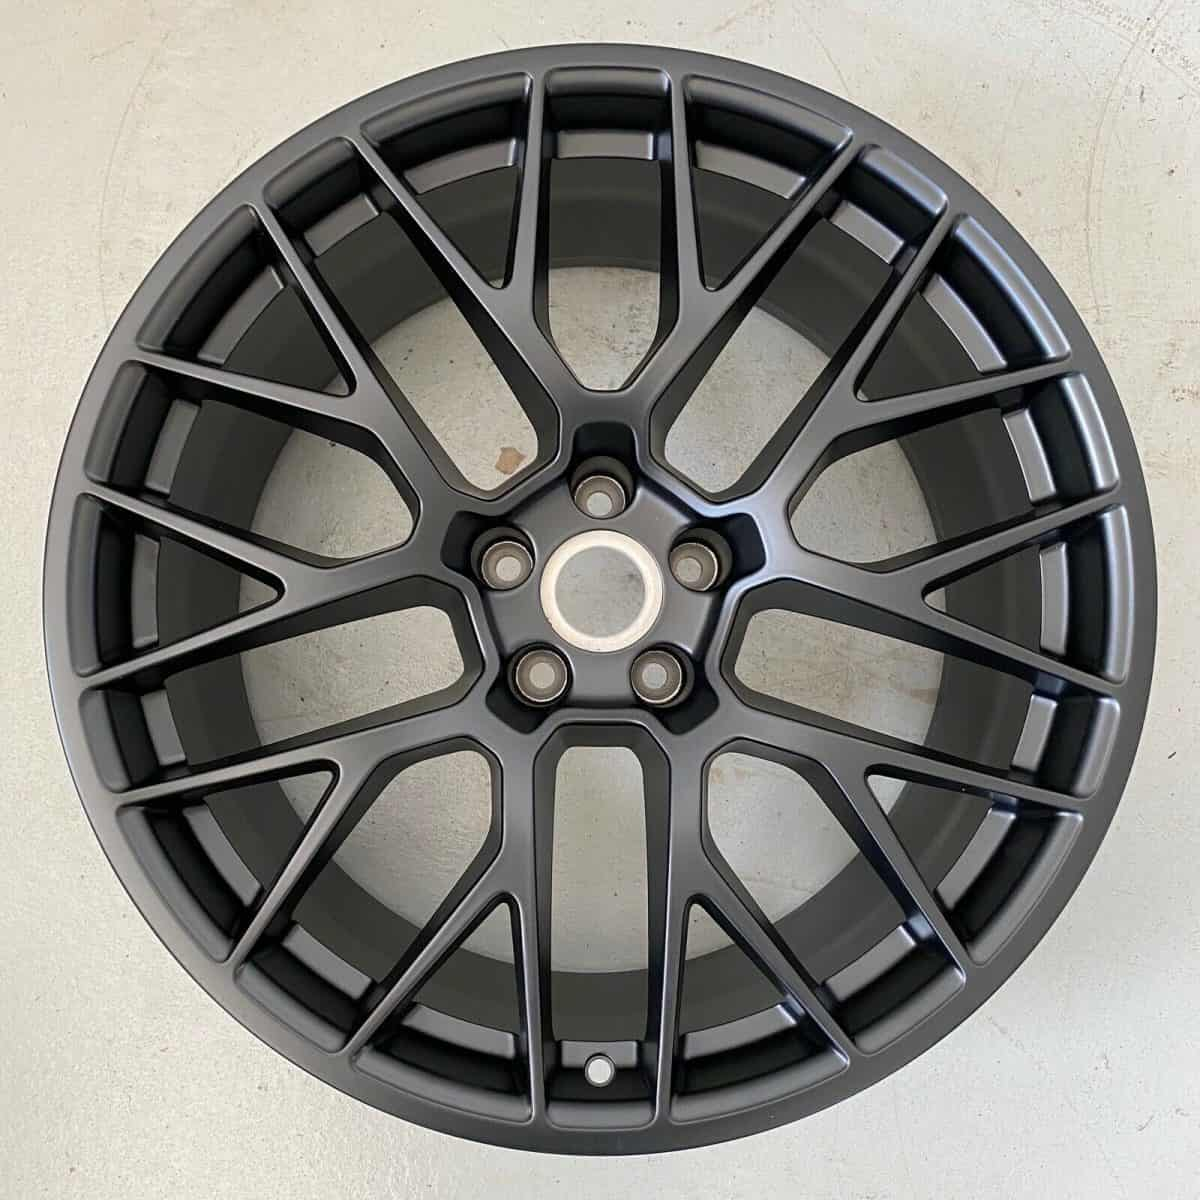 "Genuine Porsche Macan 95B RS Spyder Spoke 20"" inch Alloy Wheels with Satin Black Finish 95B601025BFJE1 95B601025BGJE1"